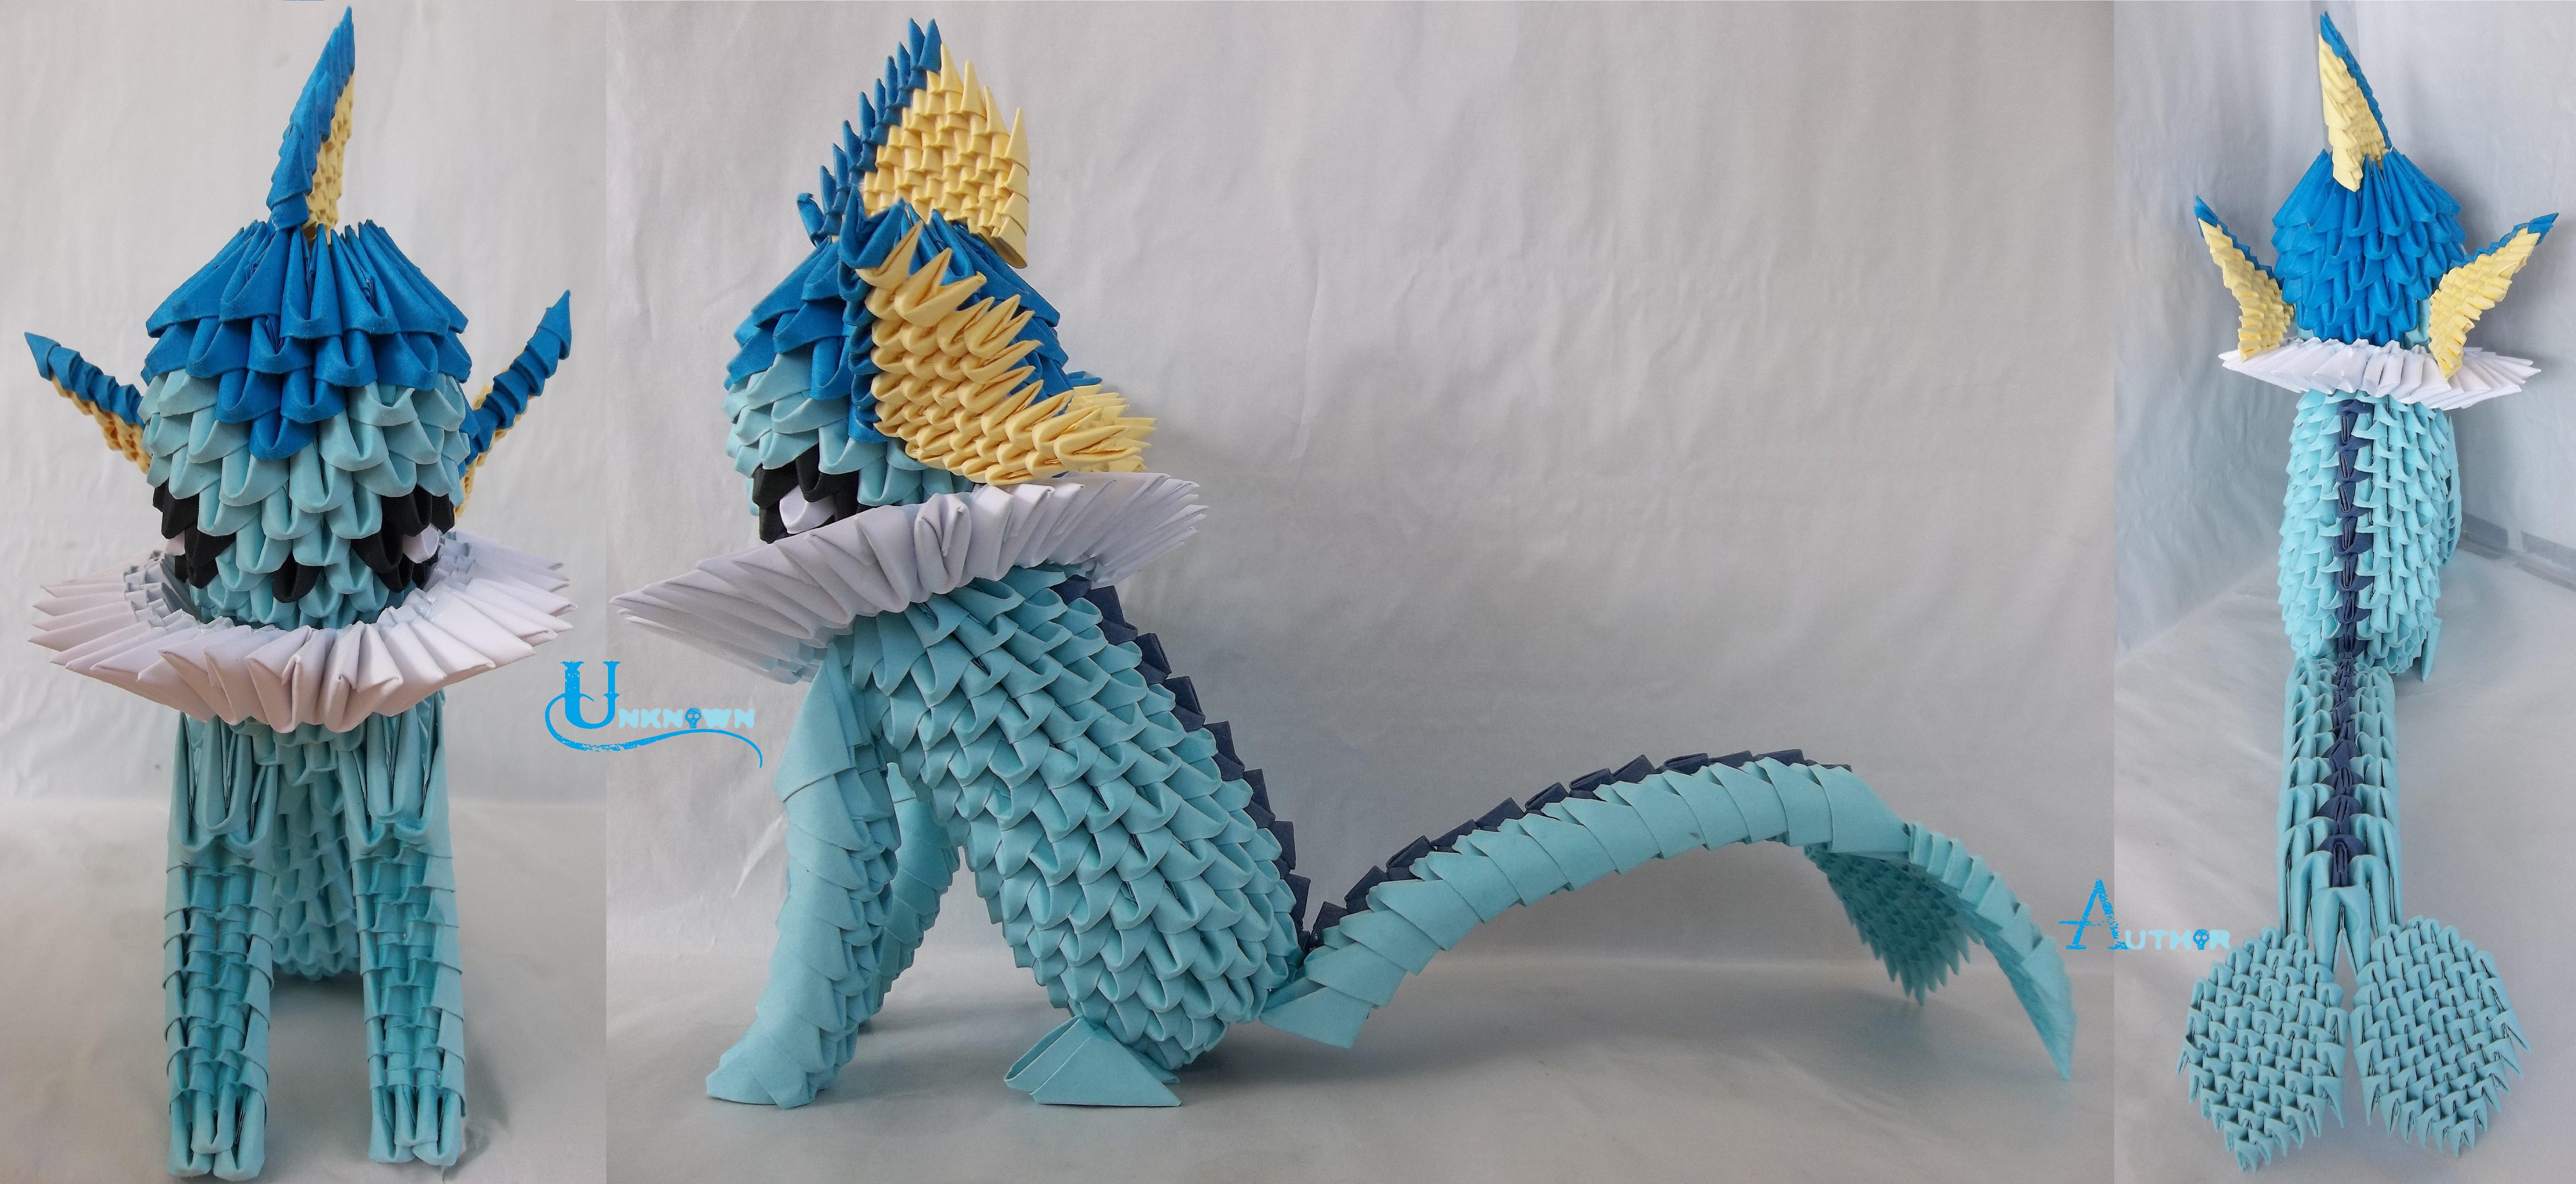 3D Origami - Vaporeon by Jobe3DO on DeviantArt - photo#38